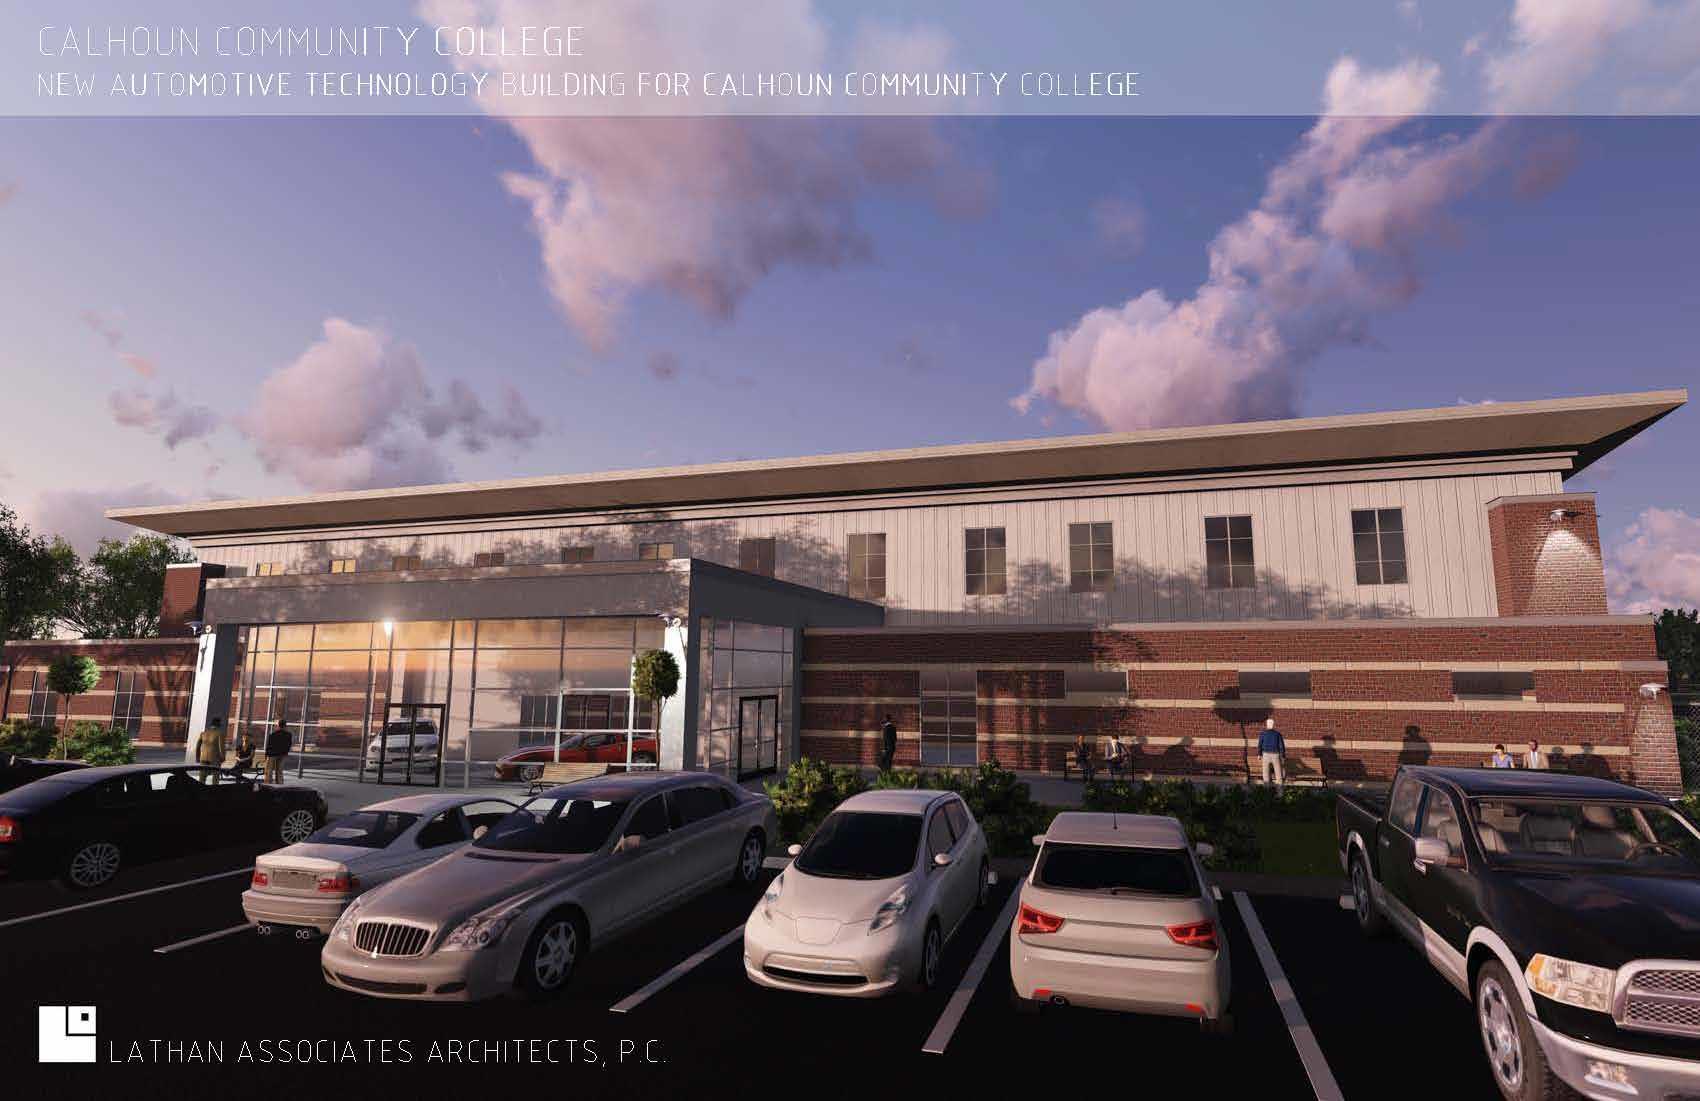 Calhoun Community College Awarded $1.5 Million Grant for ...